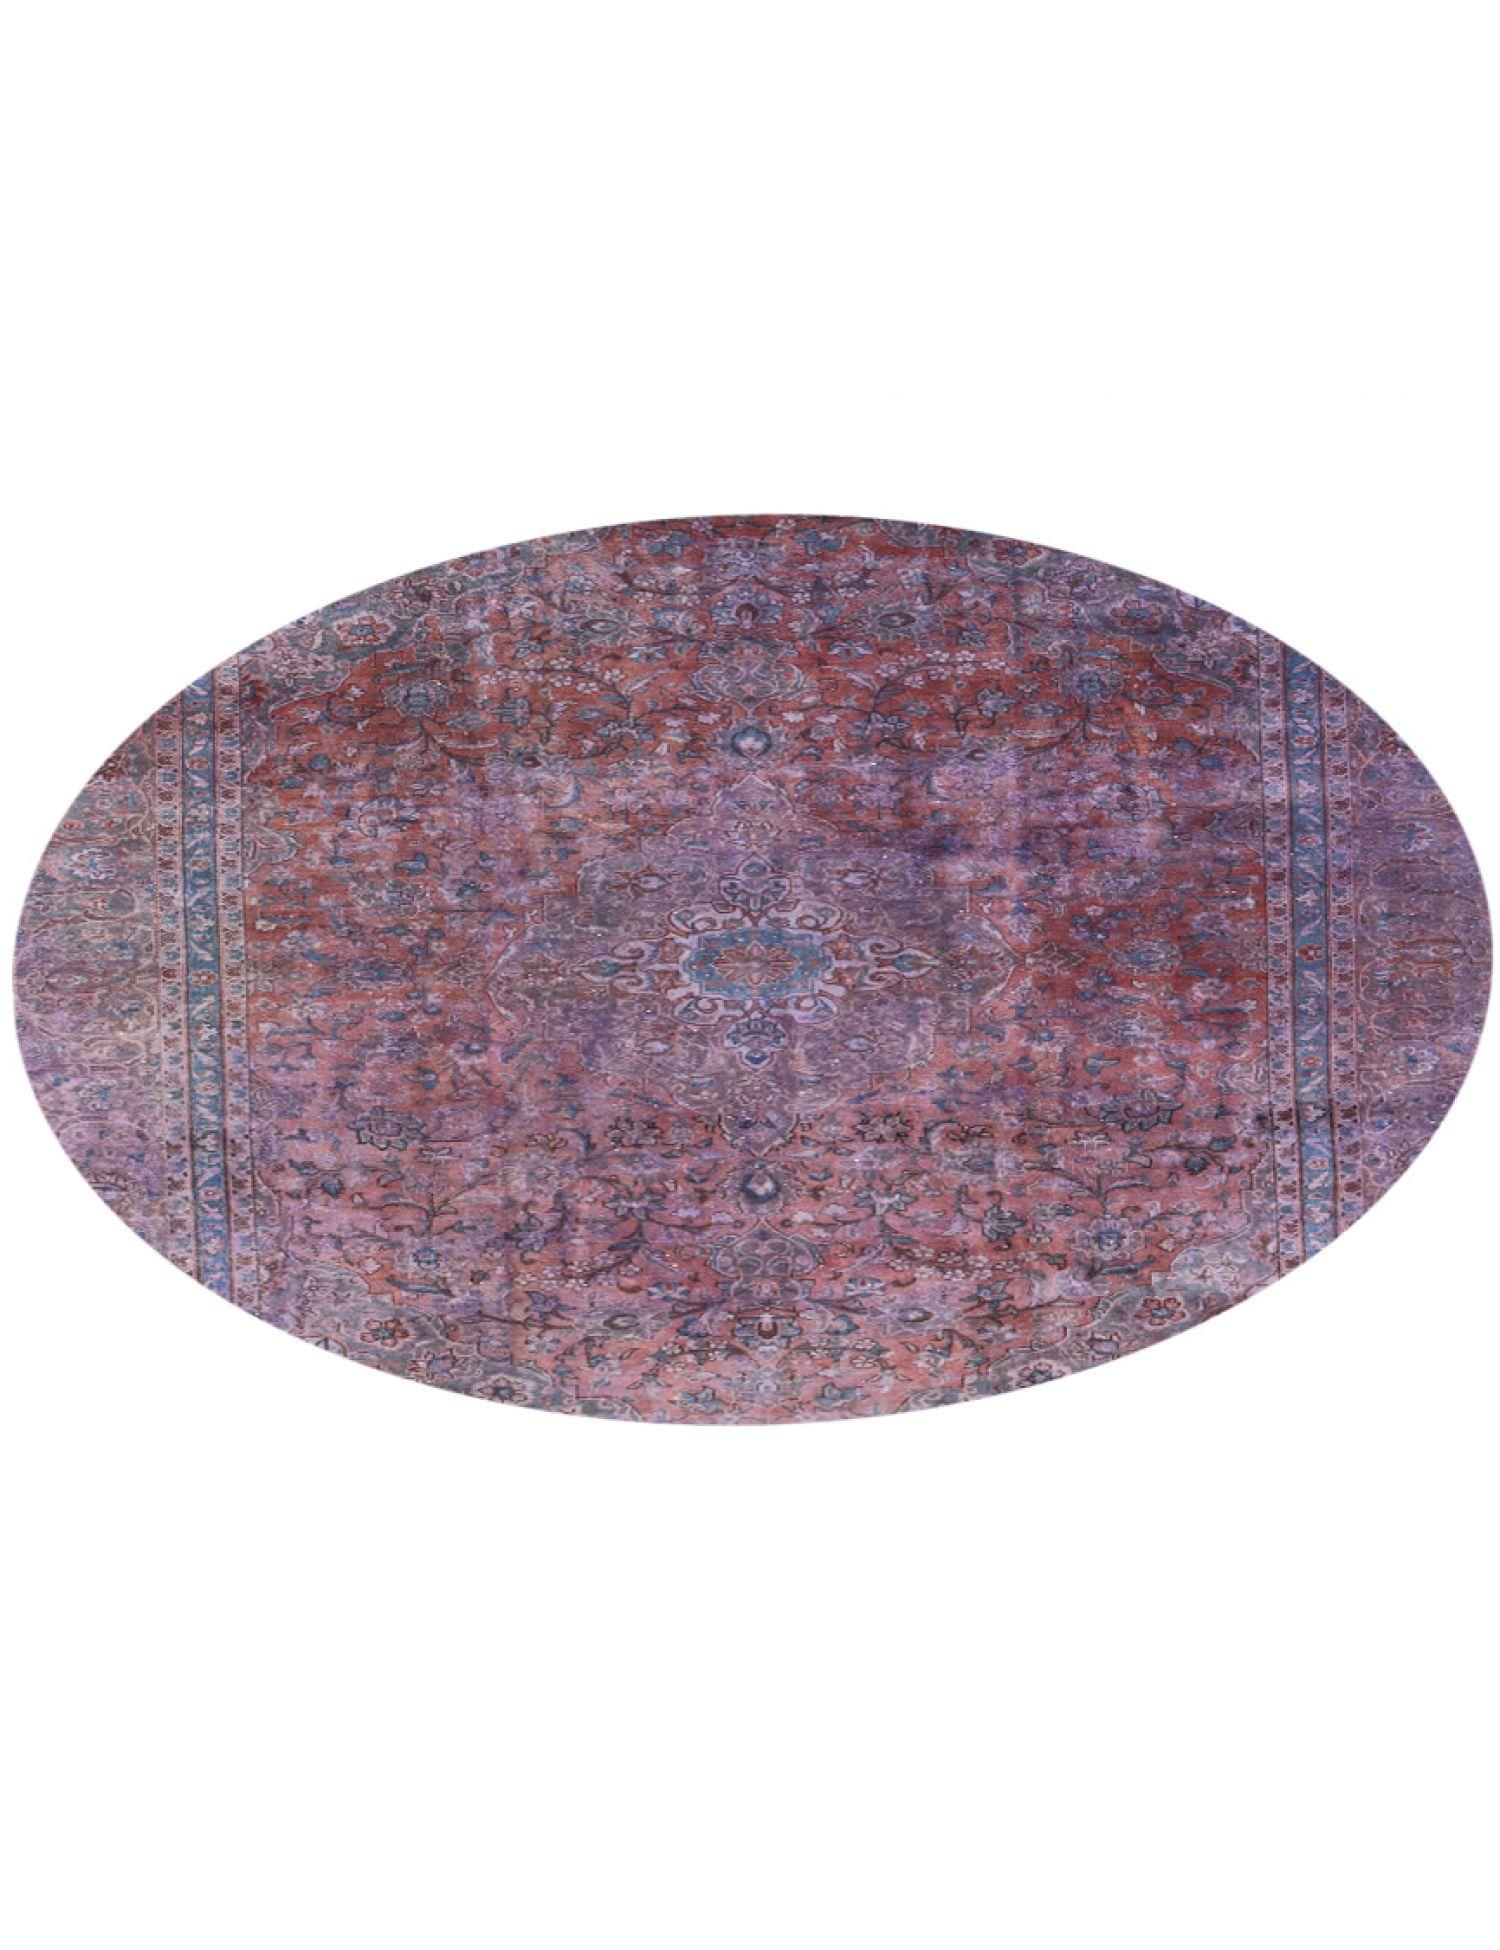 Tappeto Vintage  viola <br/>250 x 250 cm